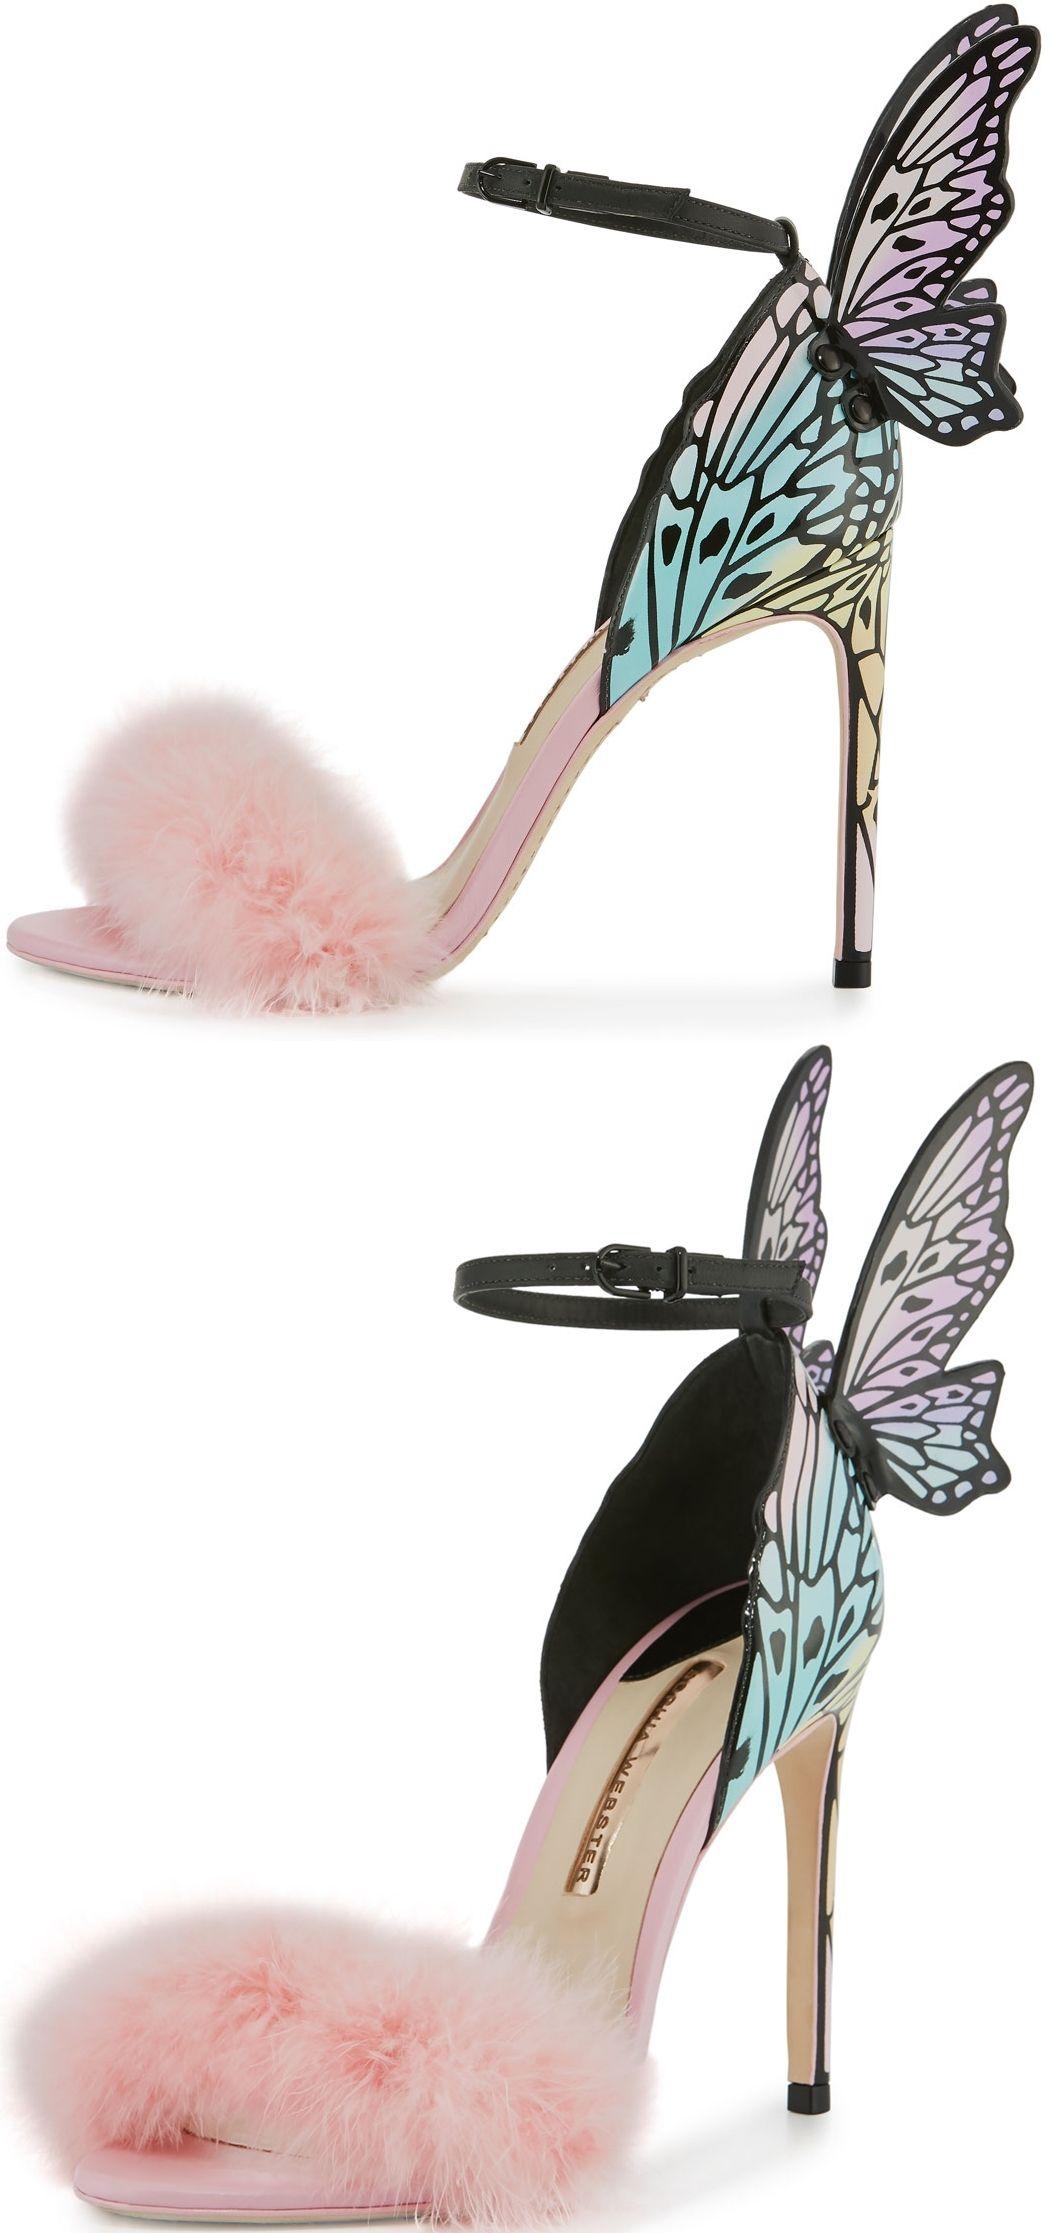 583c0756ee Sophia Webster Talulah Butterfly Wing Sandal | Sophia Webster Shoes ...